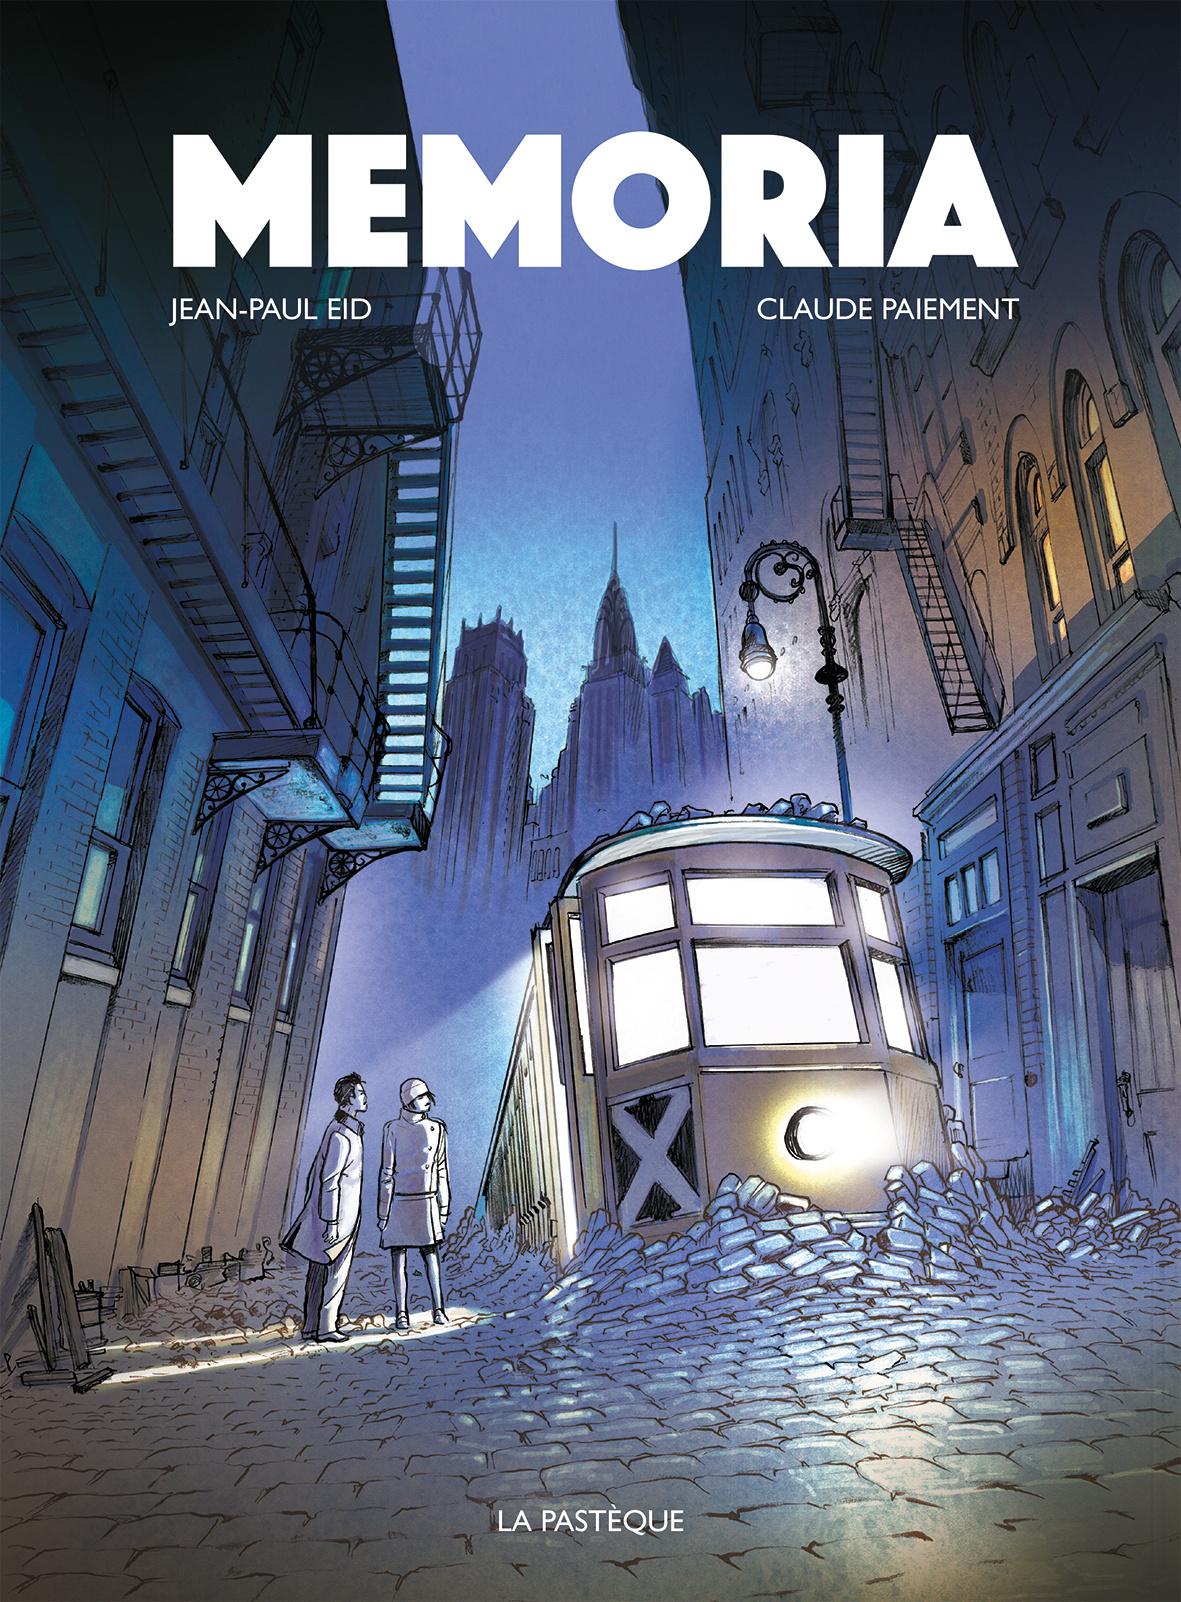 Memoria | La Pastèque | Jean-Paul Eid